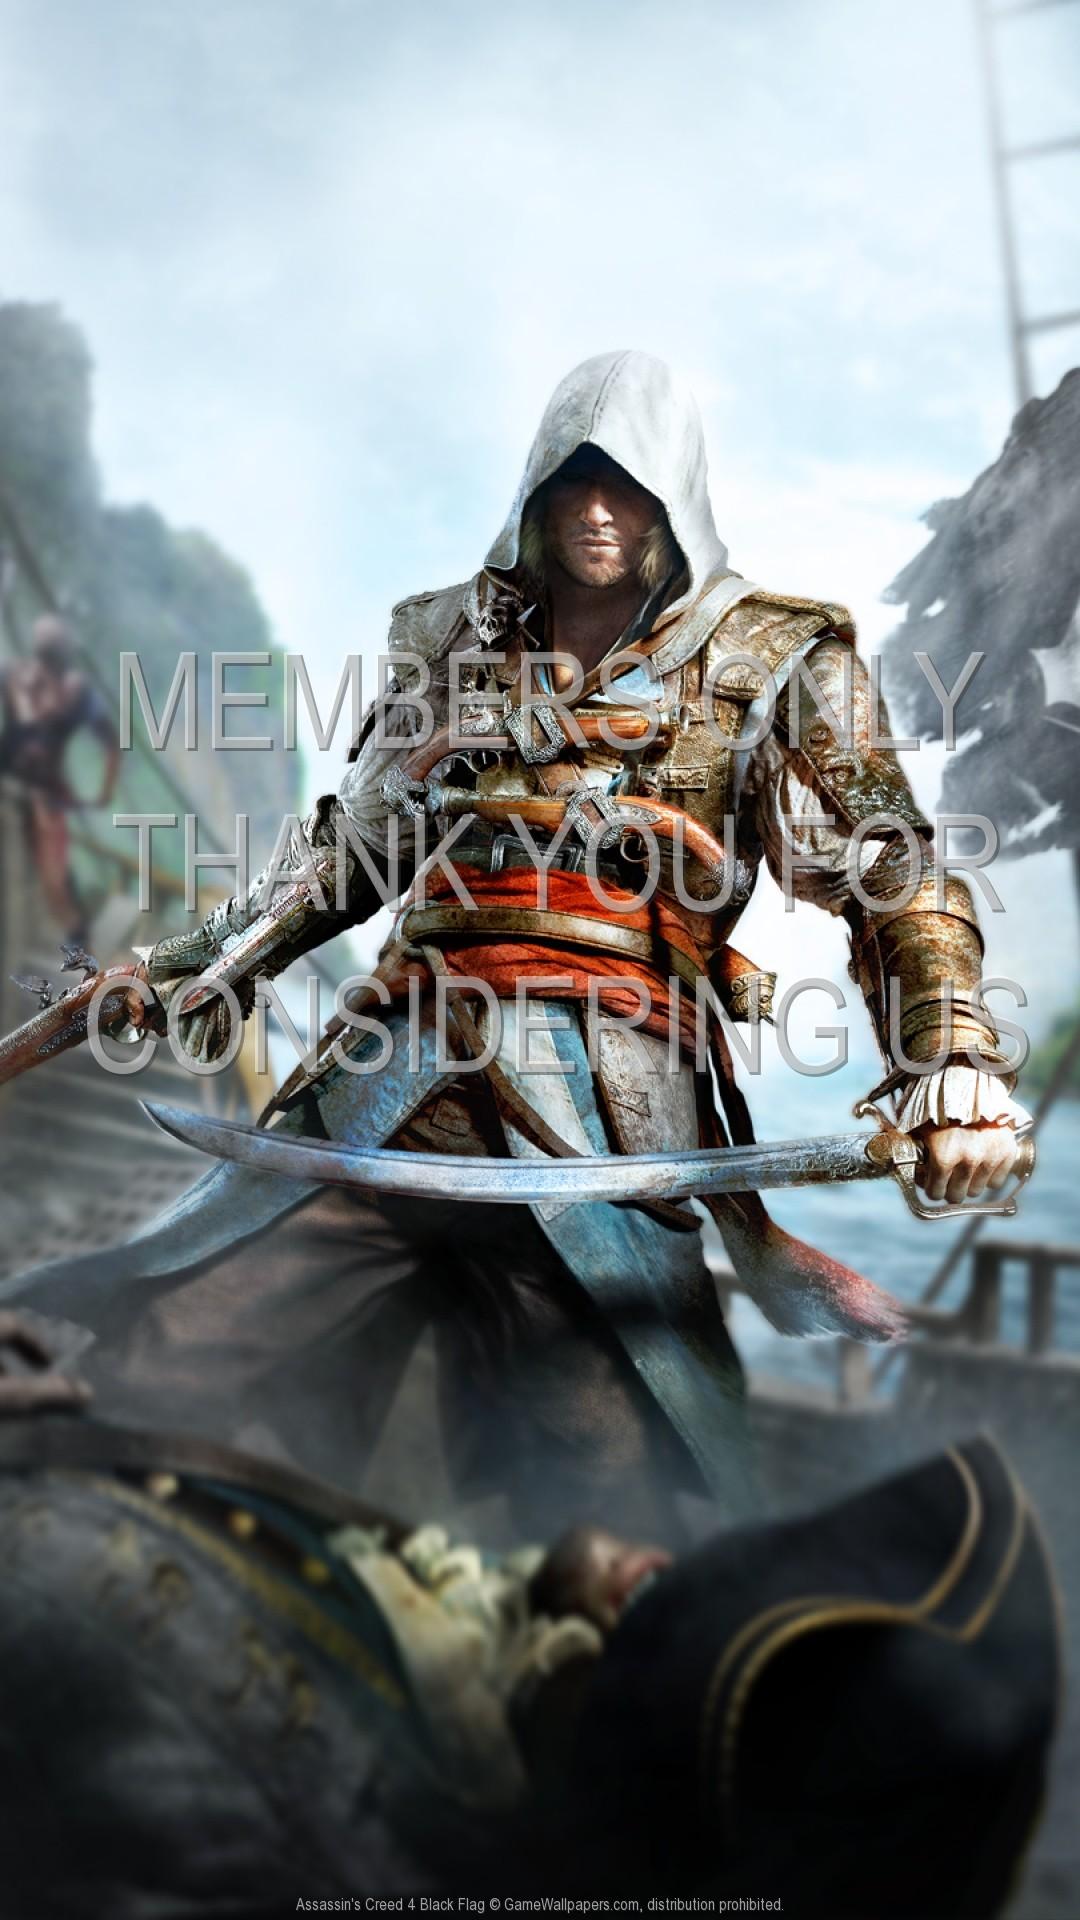 Assassin's Creed 4: Black Flag 1920×1080 Mobile wallpaper or background 04